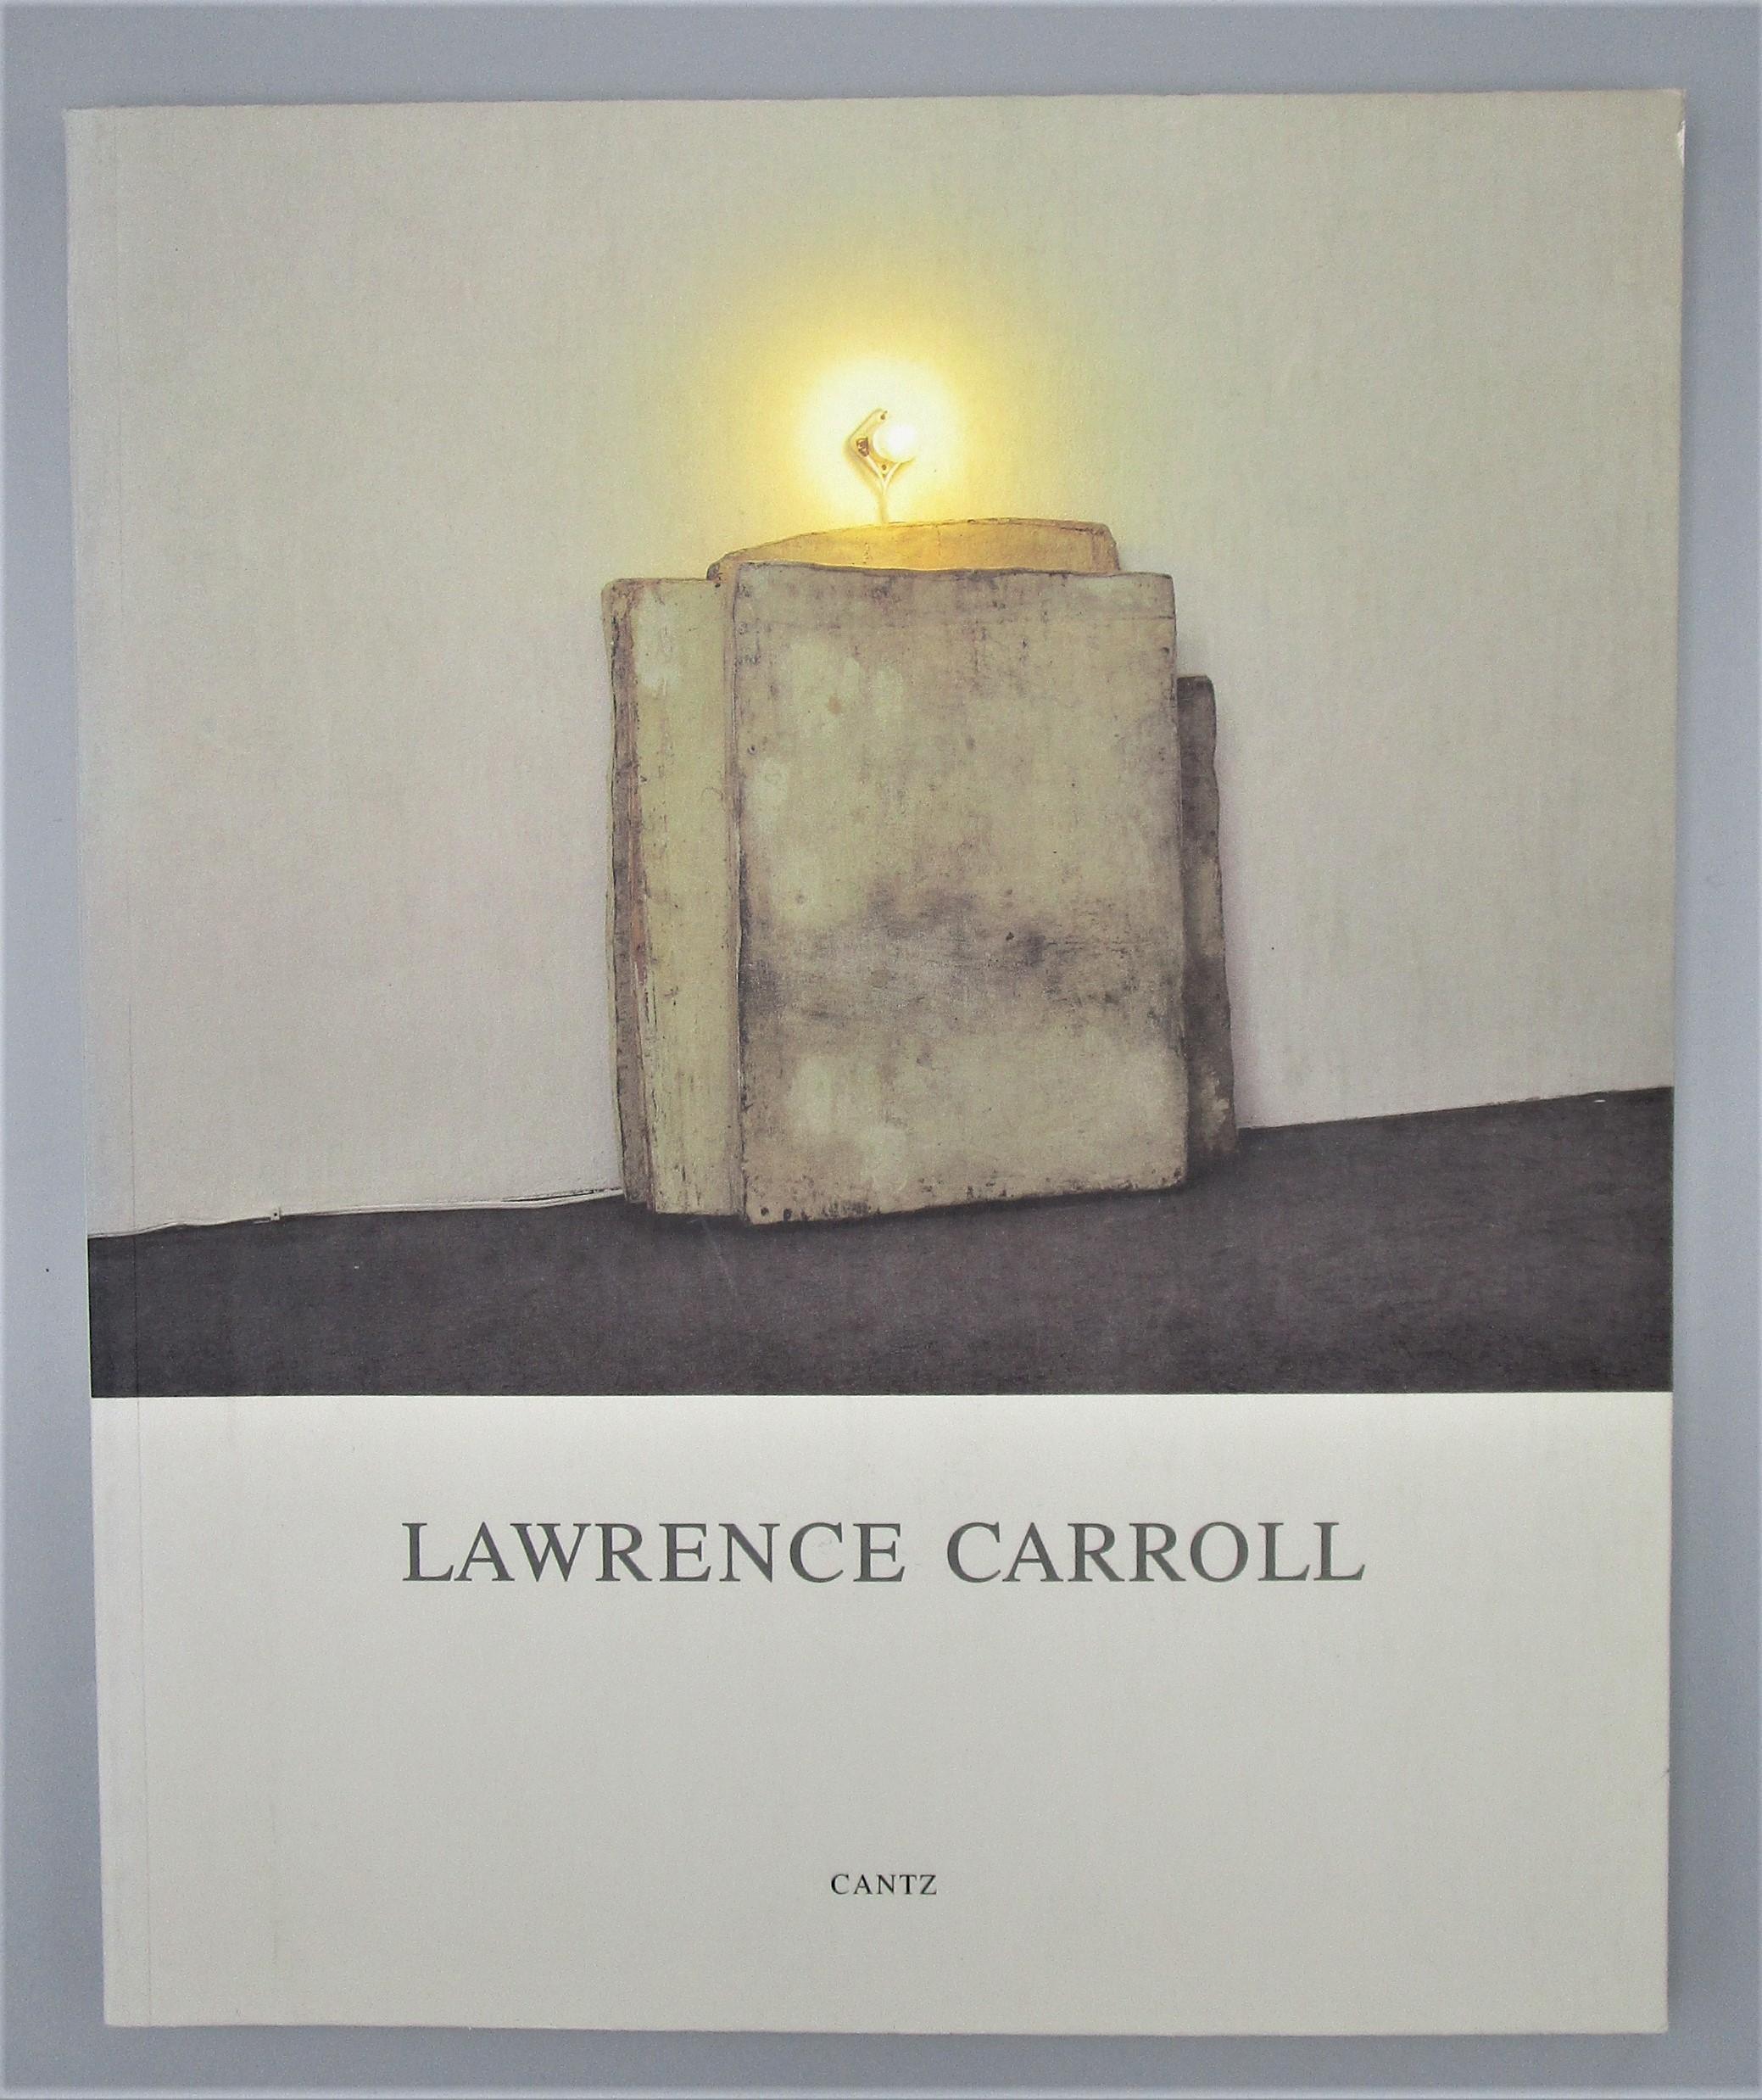 LAWRENCE CARROLL, by Richard Milazzo - 1998